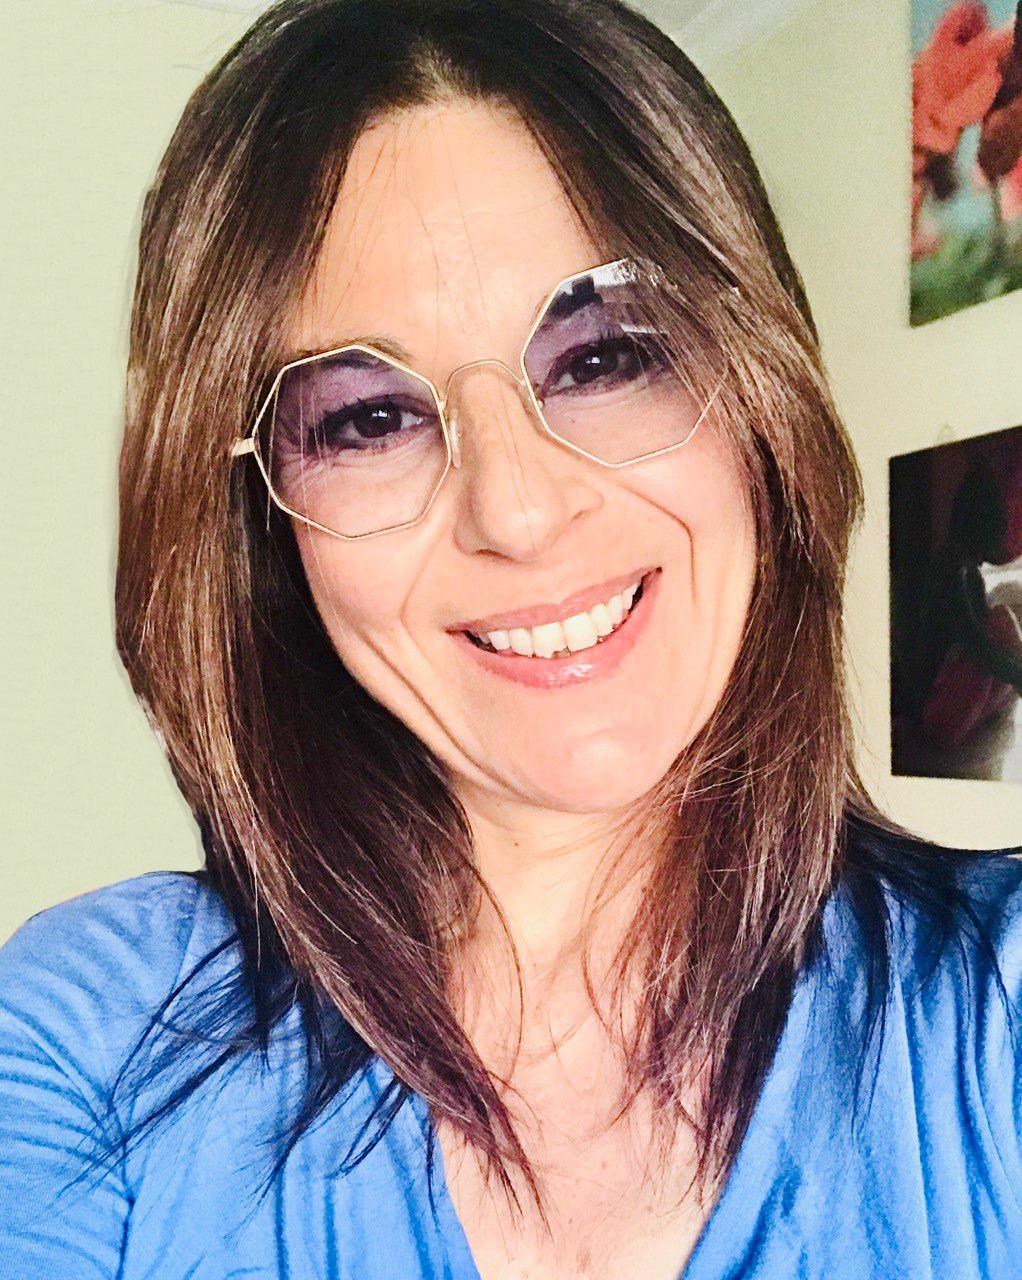 Francesca Tattoli